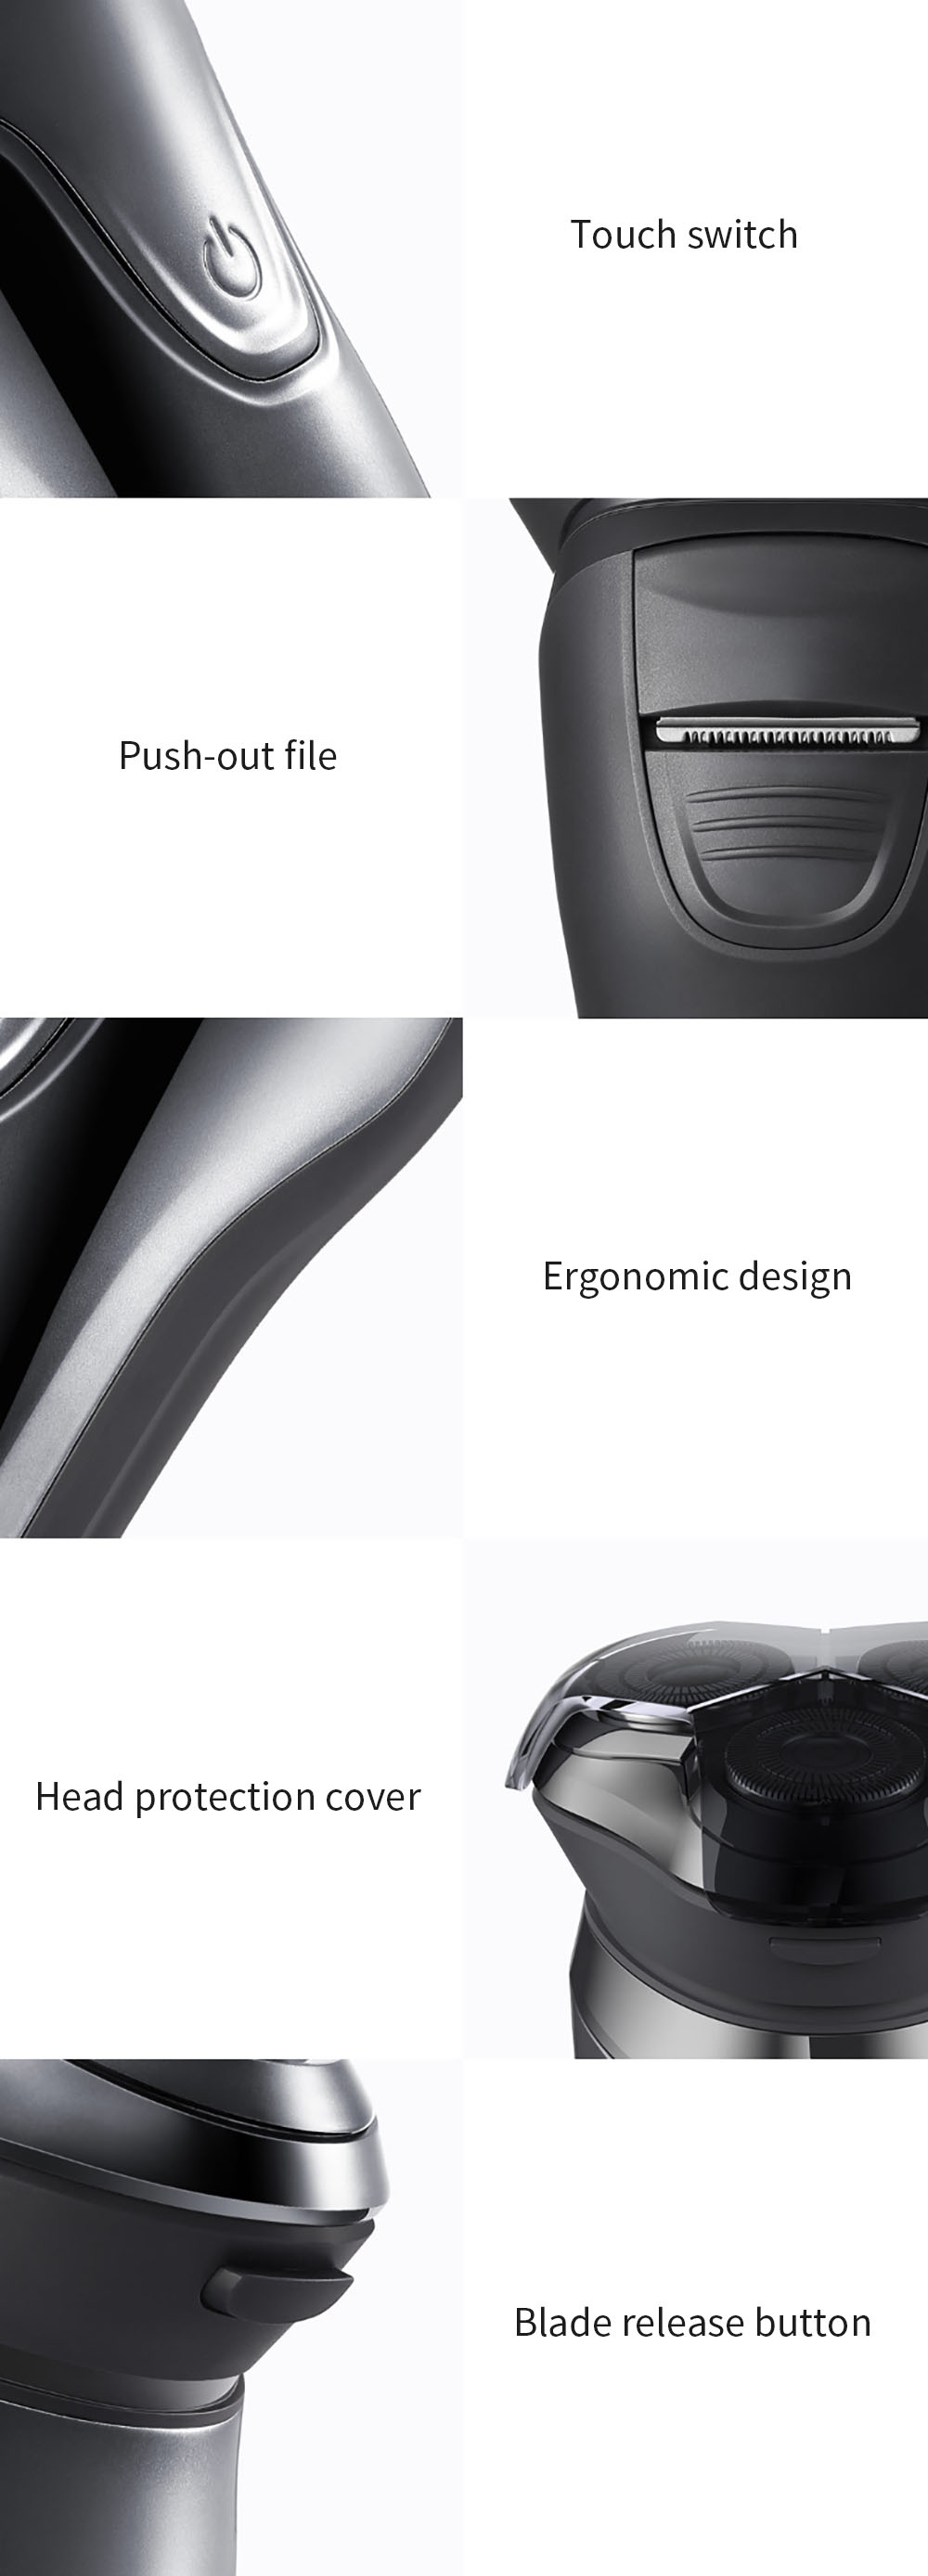 SOOCAS SO WHITE ES3 USB Rechargeable Electric Shaver xiaomi razor 3 head Electric Razor for men beard trimmer shaving machine 12